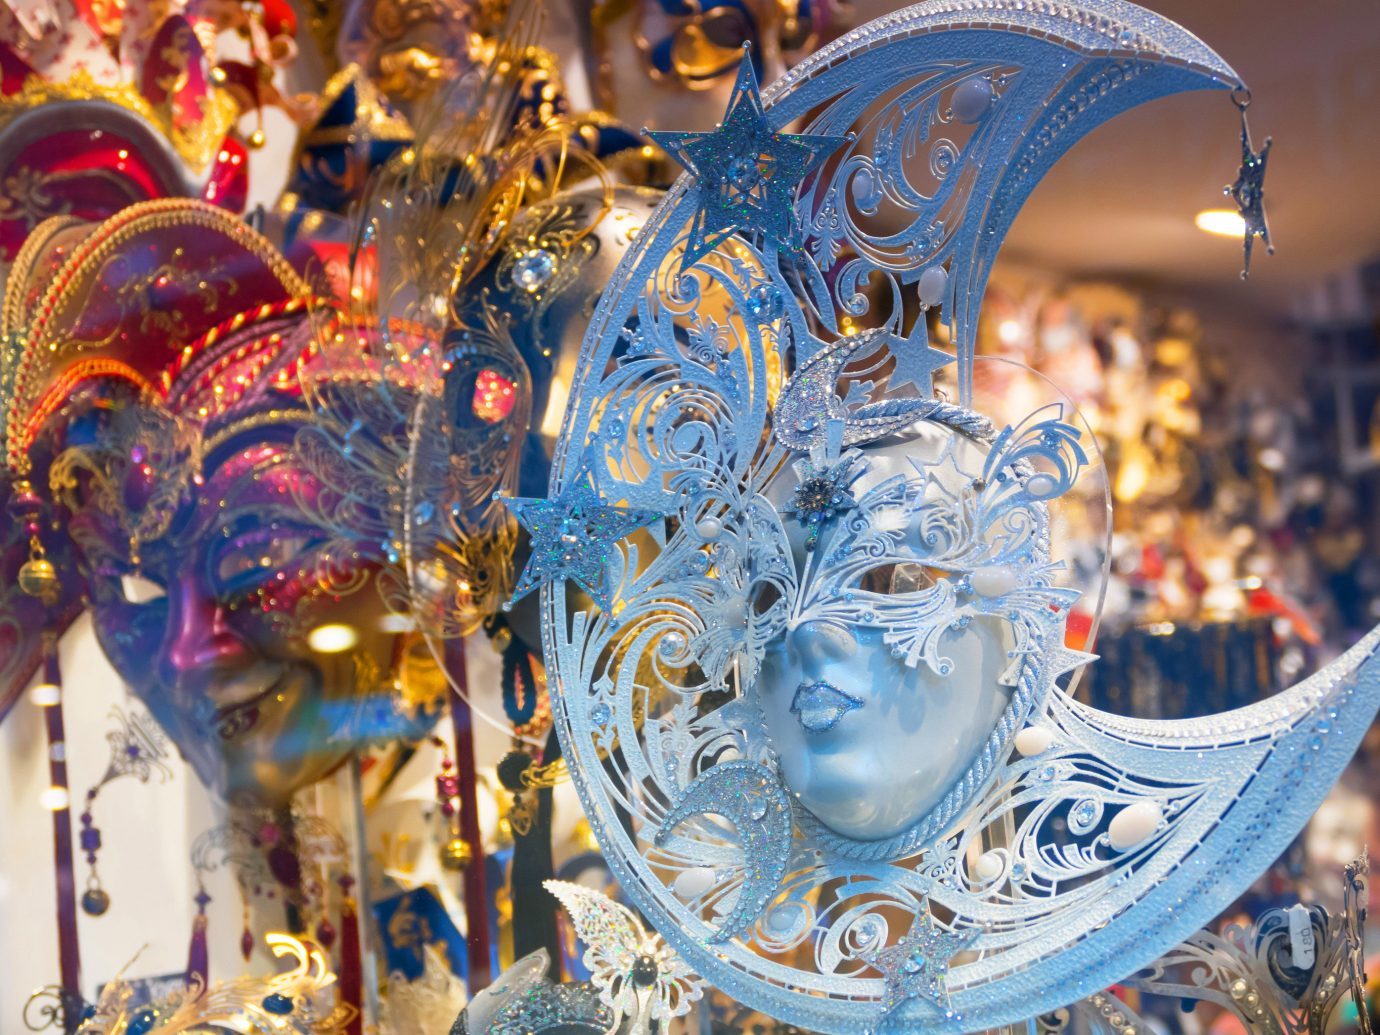 Trip Ideas indoor carnival festival event amusement park decorated amusement ride